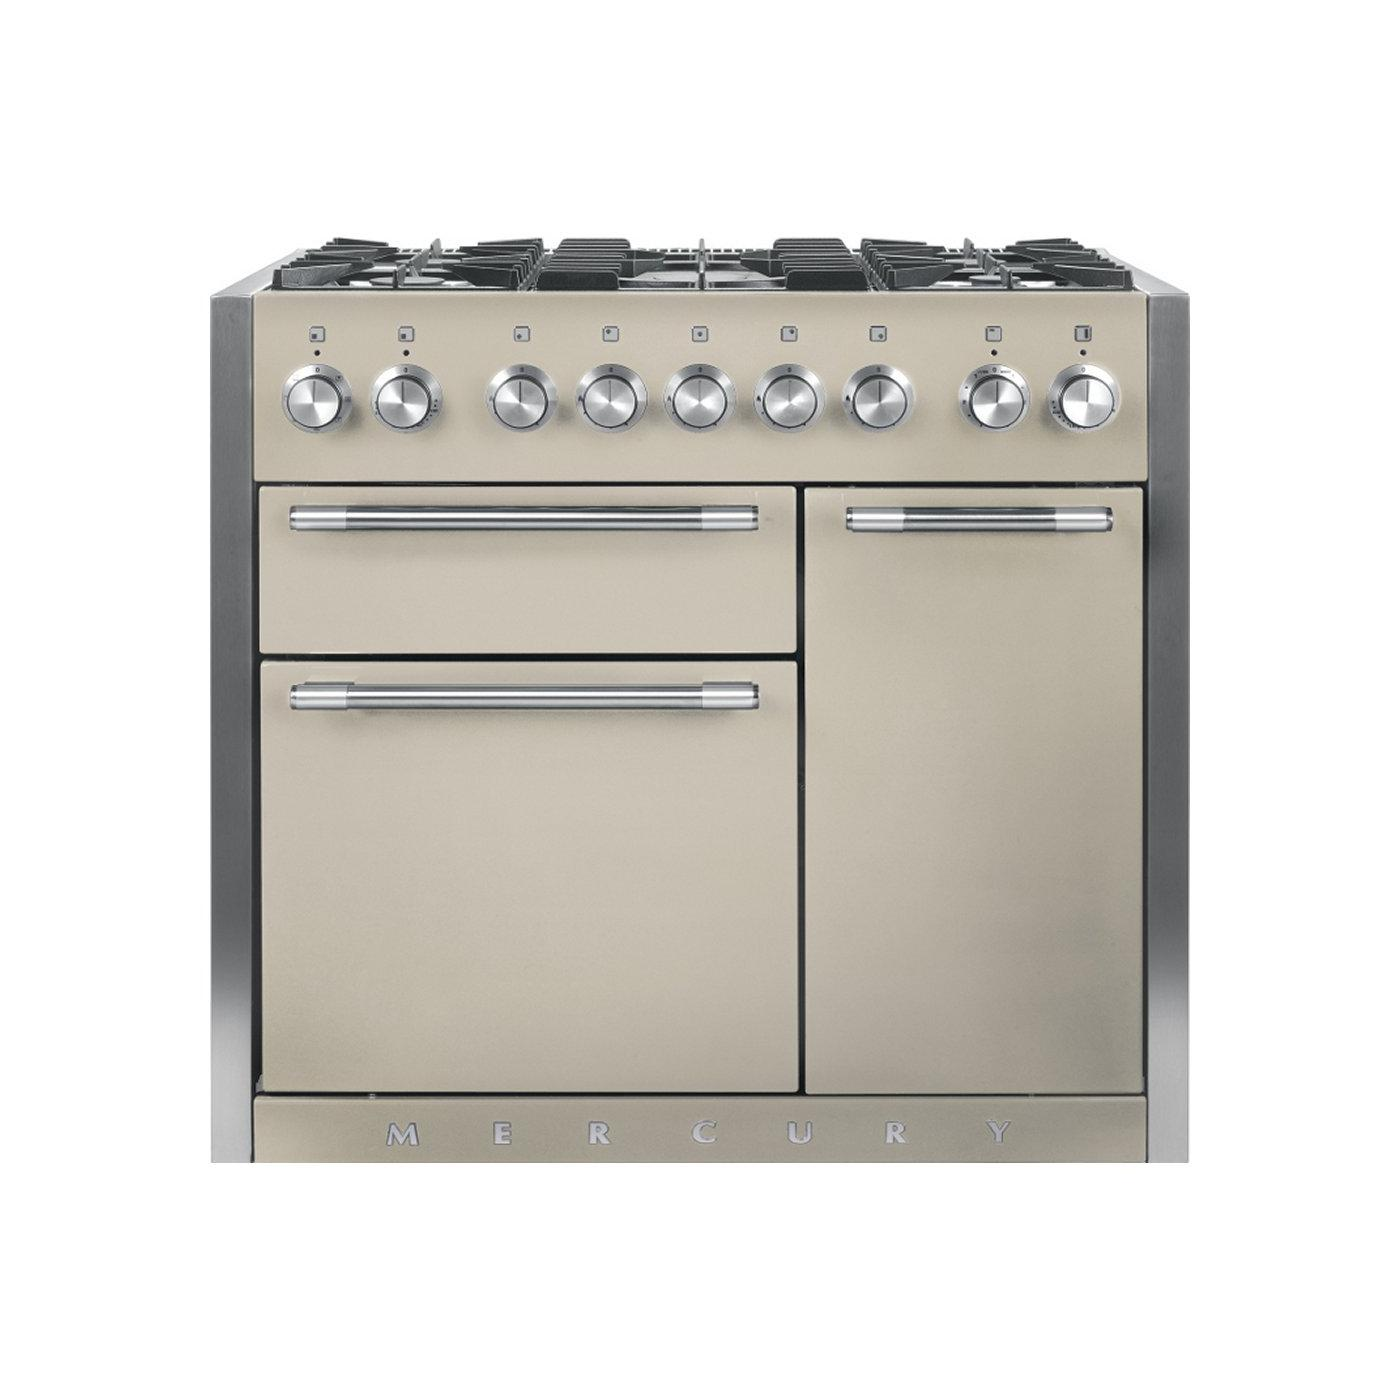 MCY1000DFOY 93180 100cm Dual Fuel Range Cooker